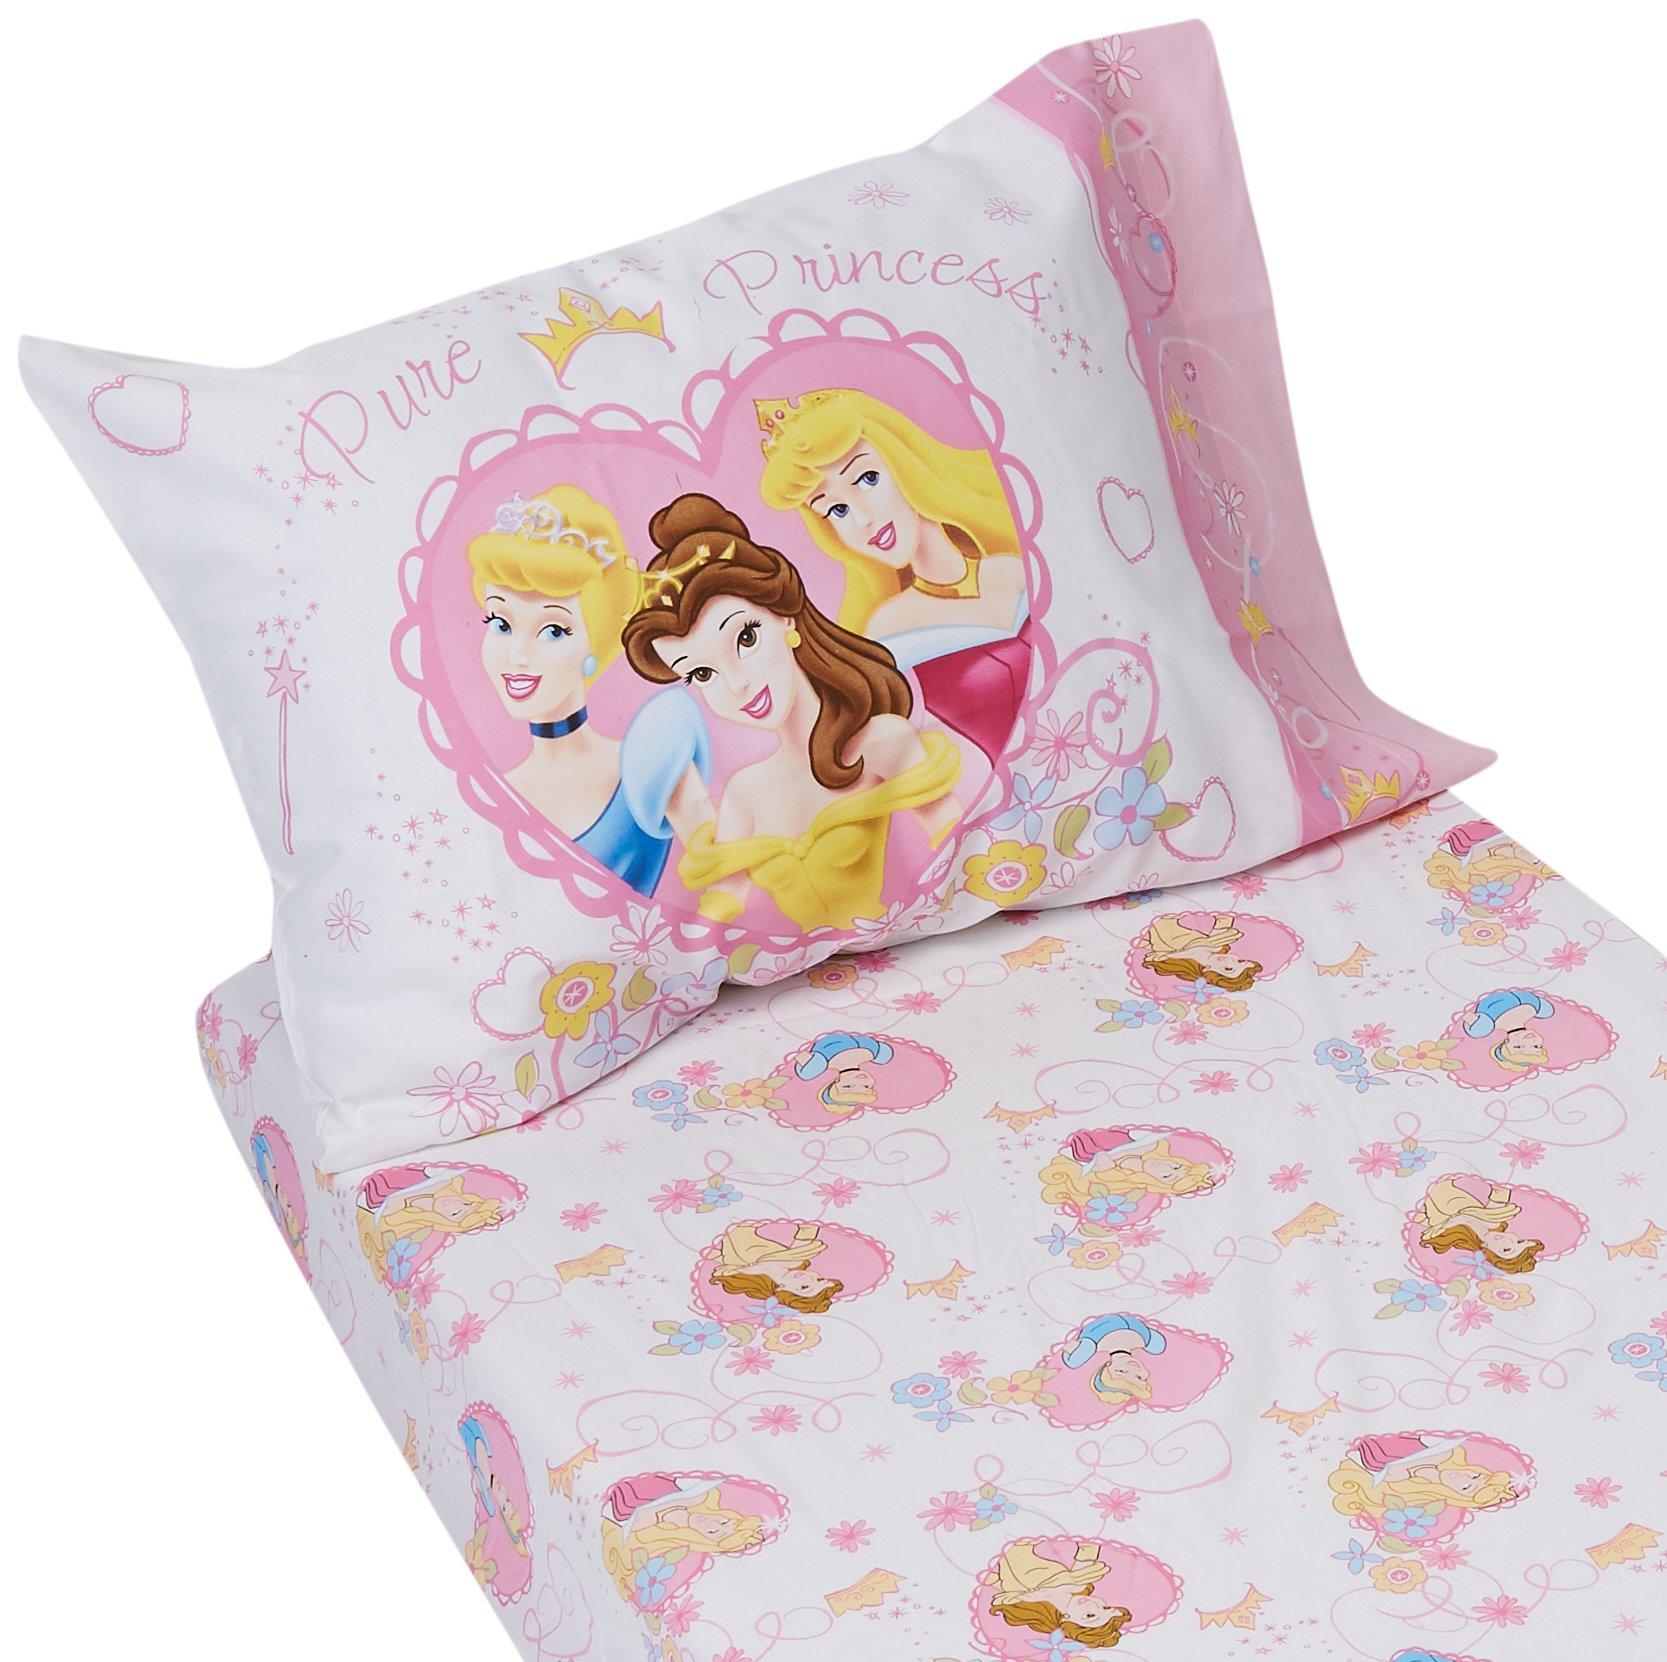 Disney Princess Castle Dreams 2-Piece Sheet Set (Toddler Bed) by Disney